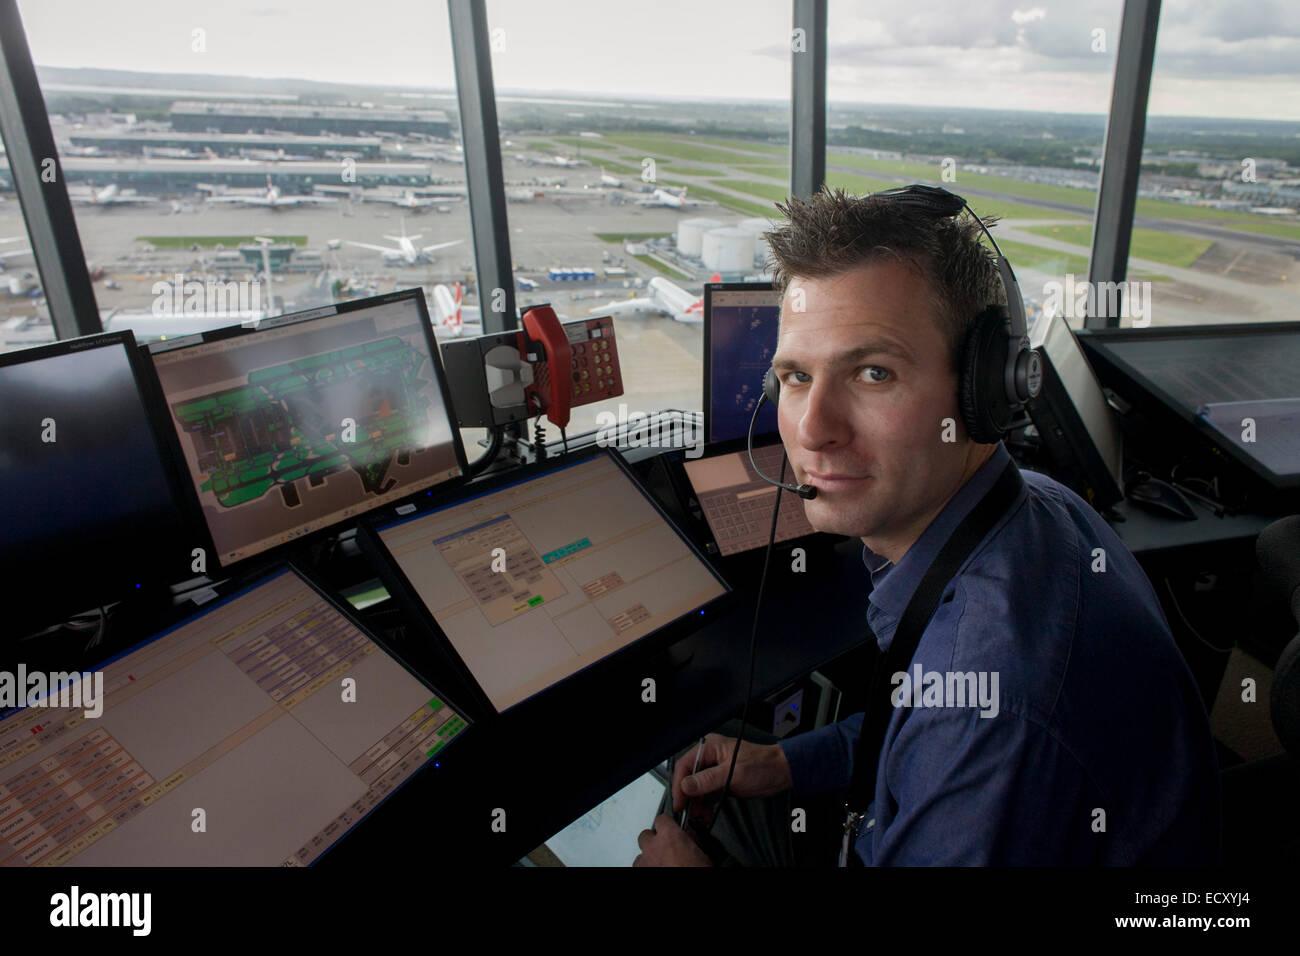 "NATS Heathrow Fluglotse im Kontrollturm am Flughafen Heathrow, London.   Aus dem Kapitel mit dem Titel ""Up Stockbild"